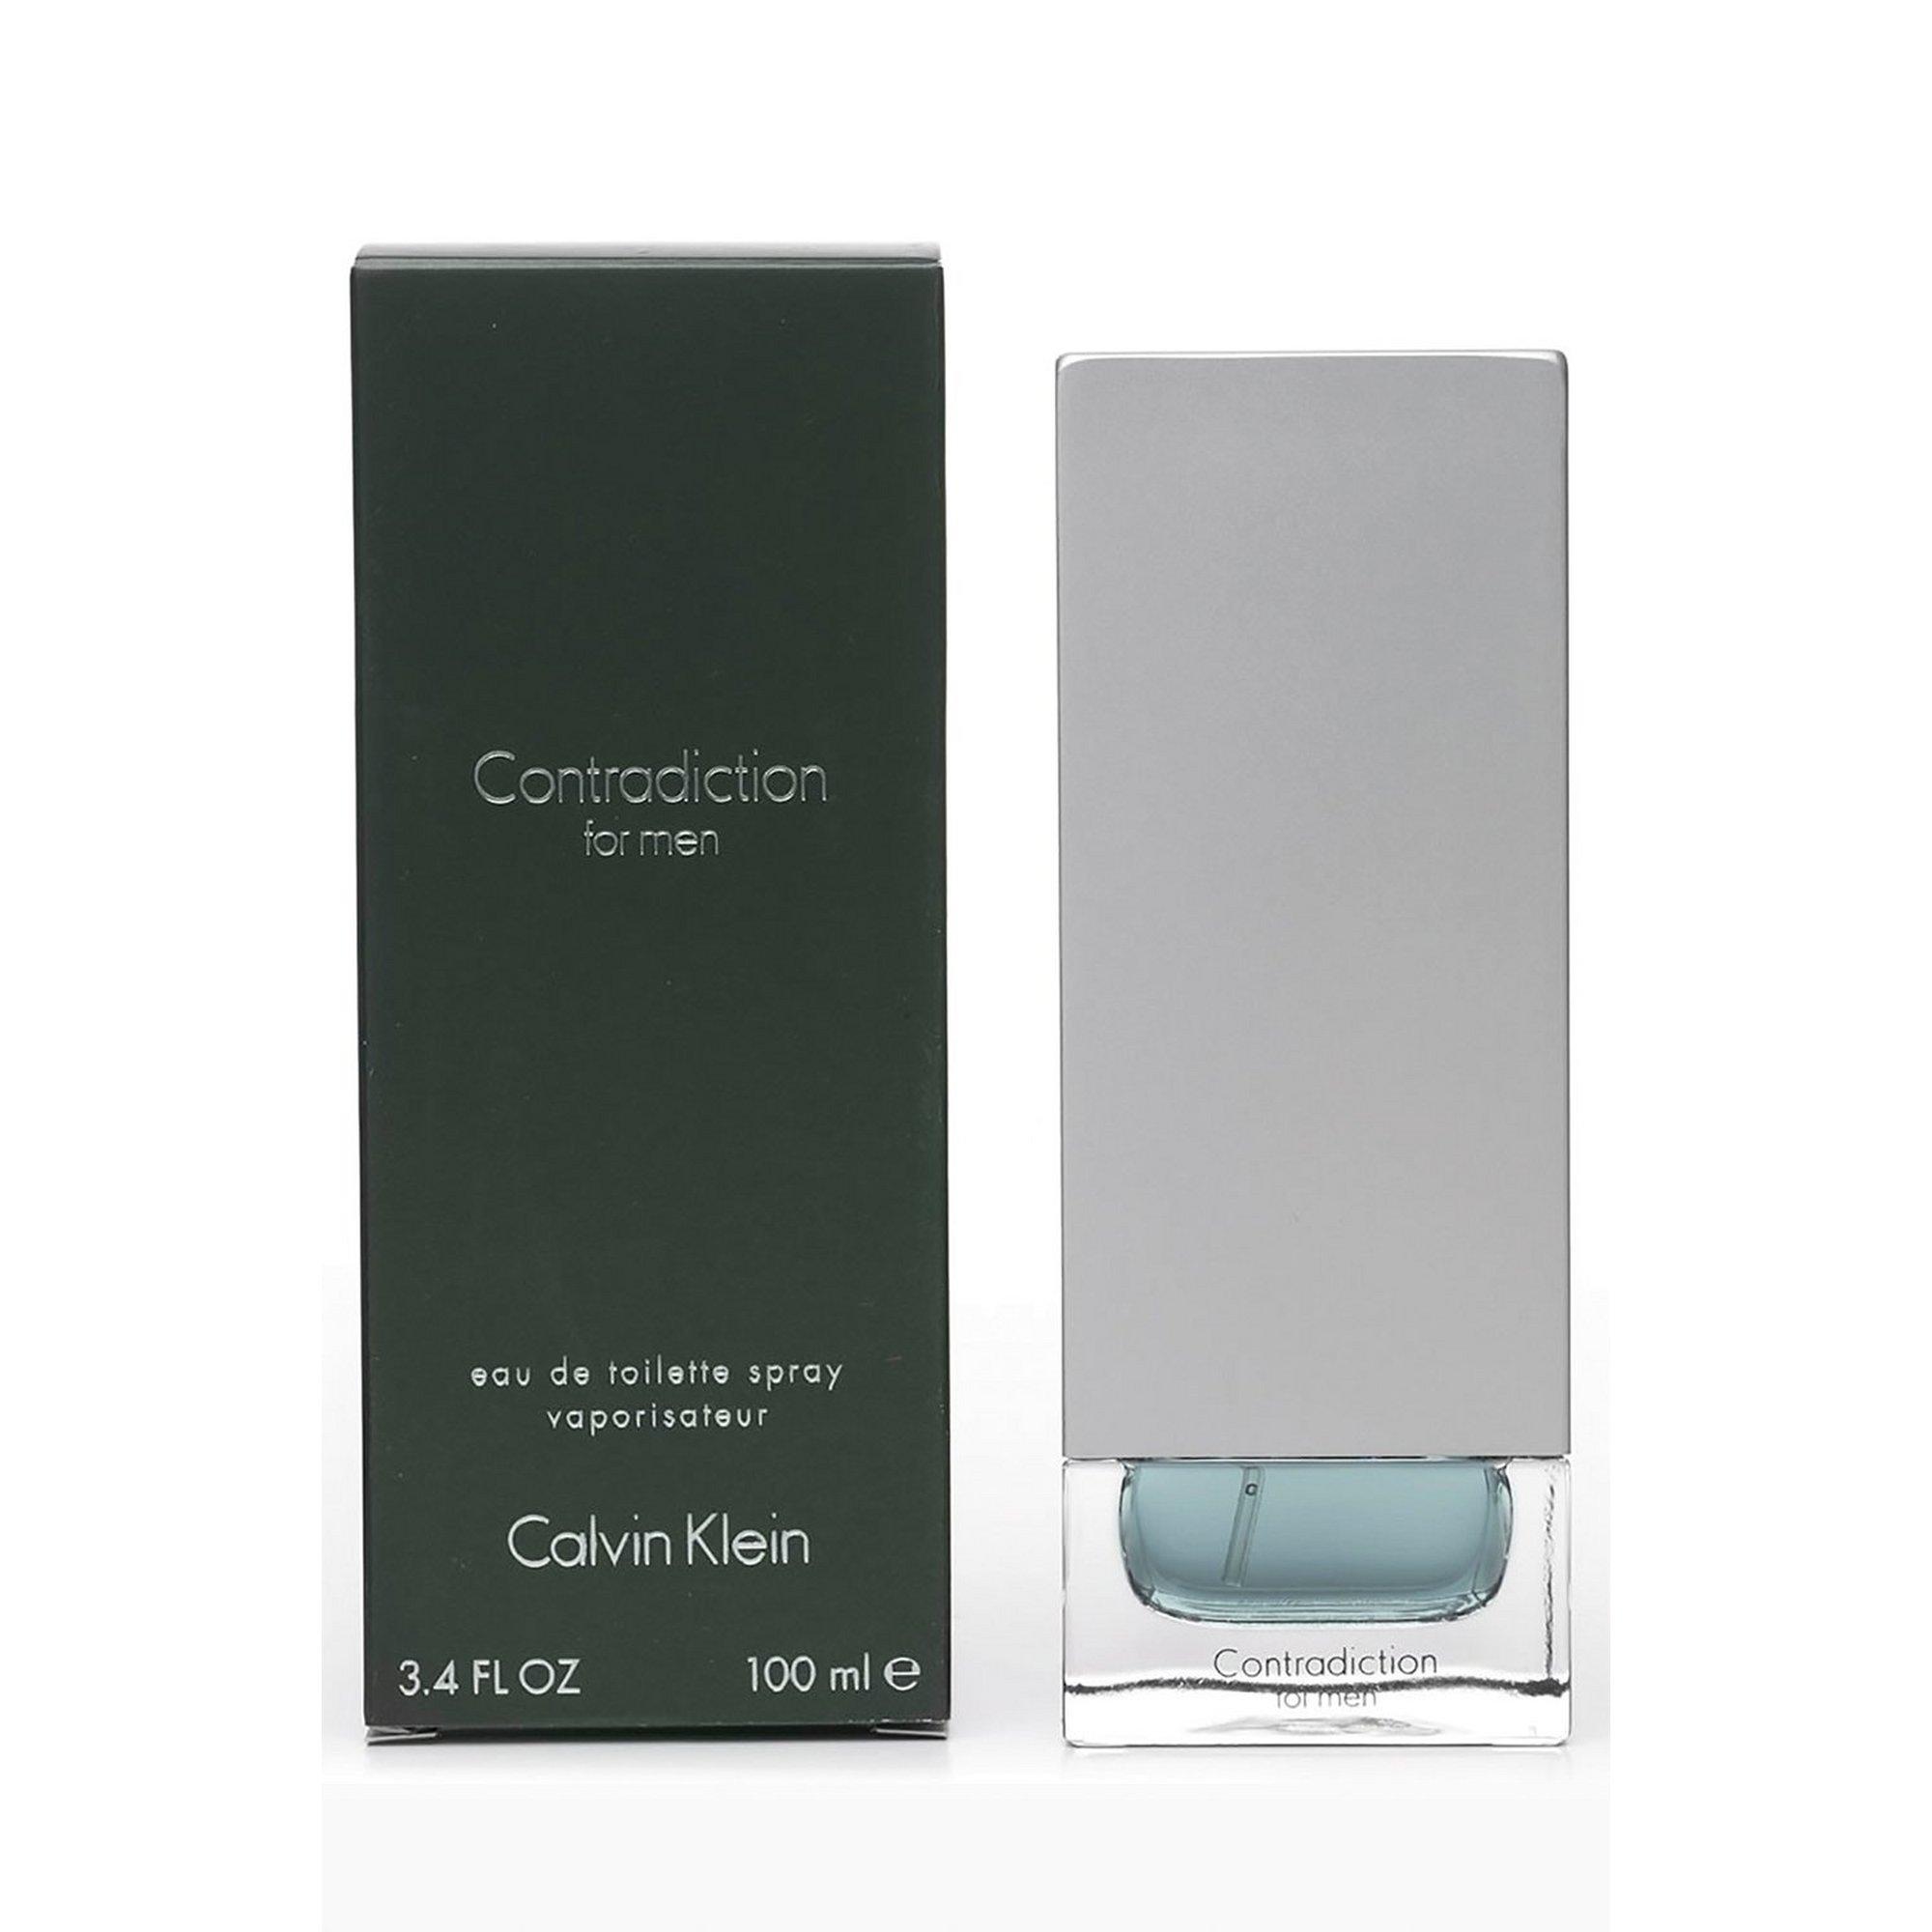 Image of Calvin Klein Contradiction For Men 100ml EDT Spray